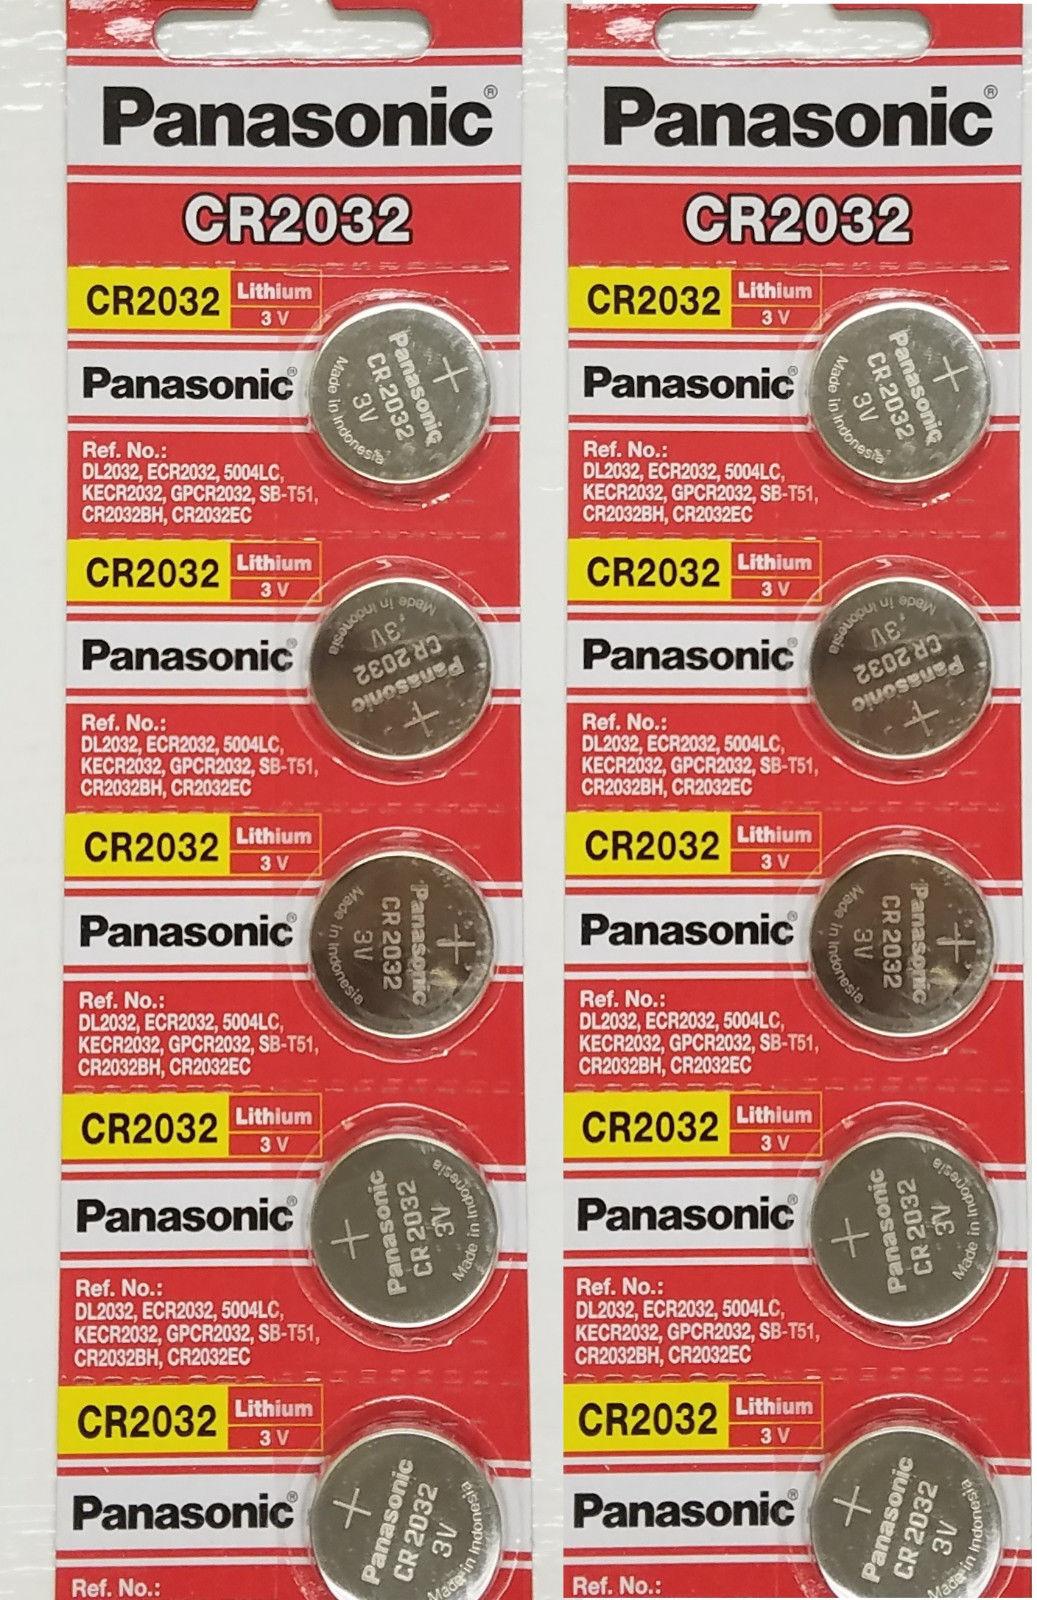 10 x SUPER FRESH Panasonic ECR2032 CR2032 Lithium Battery 3V Coin Cell Exp. 2030 Consumer Electronics